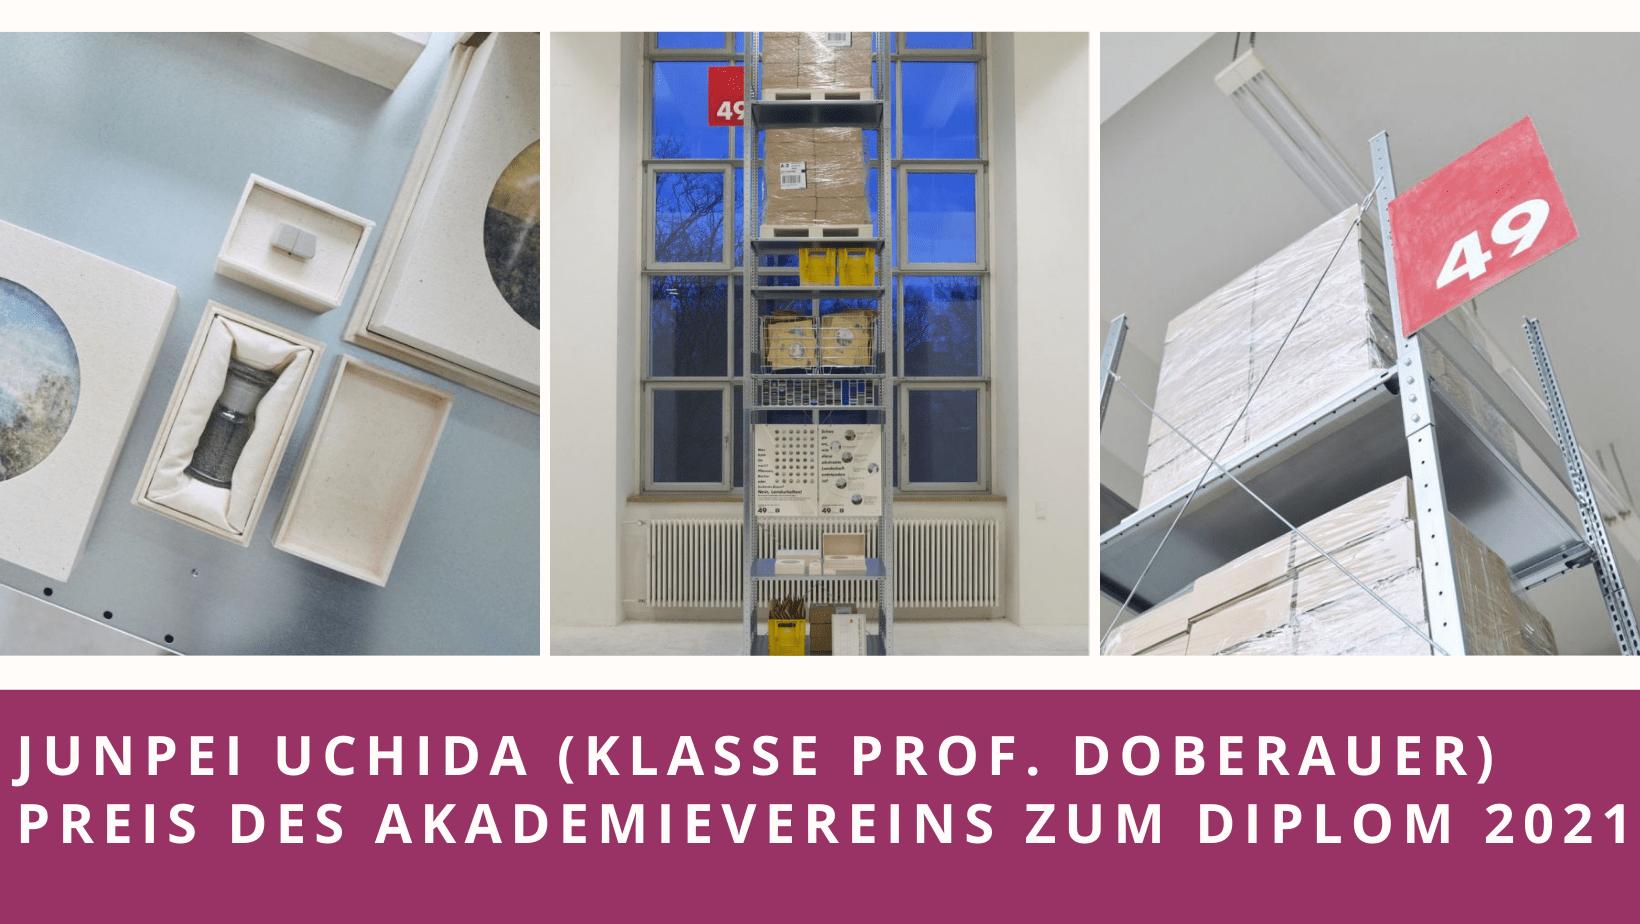 Junpe Uchida (Klass Prof. Doberauer) erhält Preis des Akademievereins zum DIplom 2021